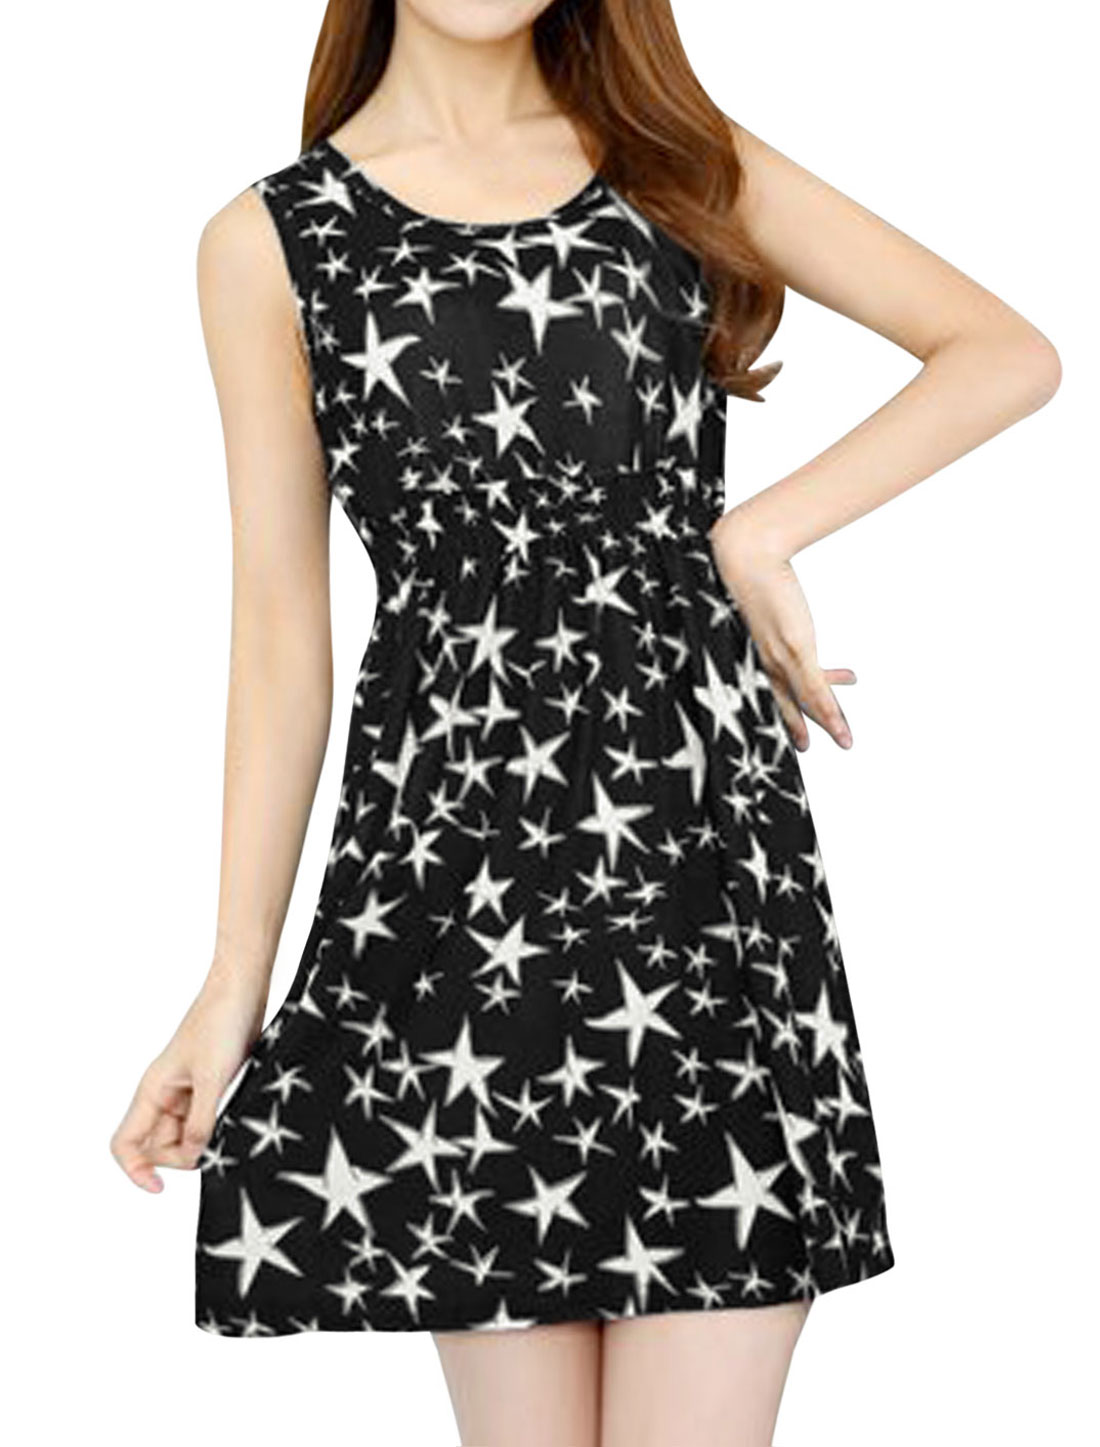 Ladies Sleeveless Round Neck Stars Print Mini Dress Black White XS